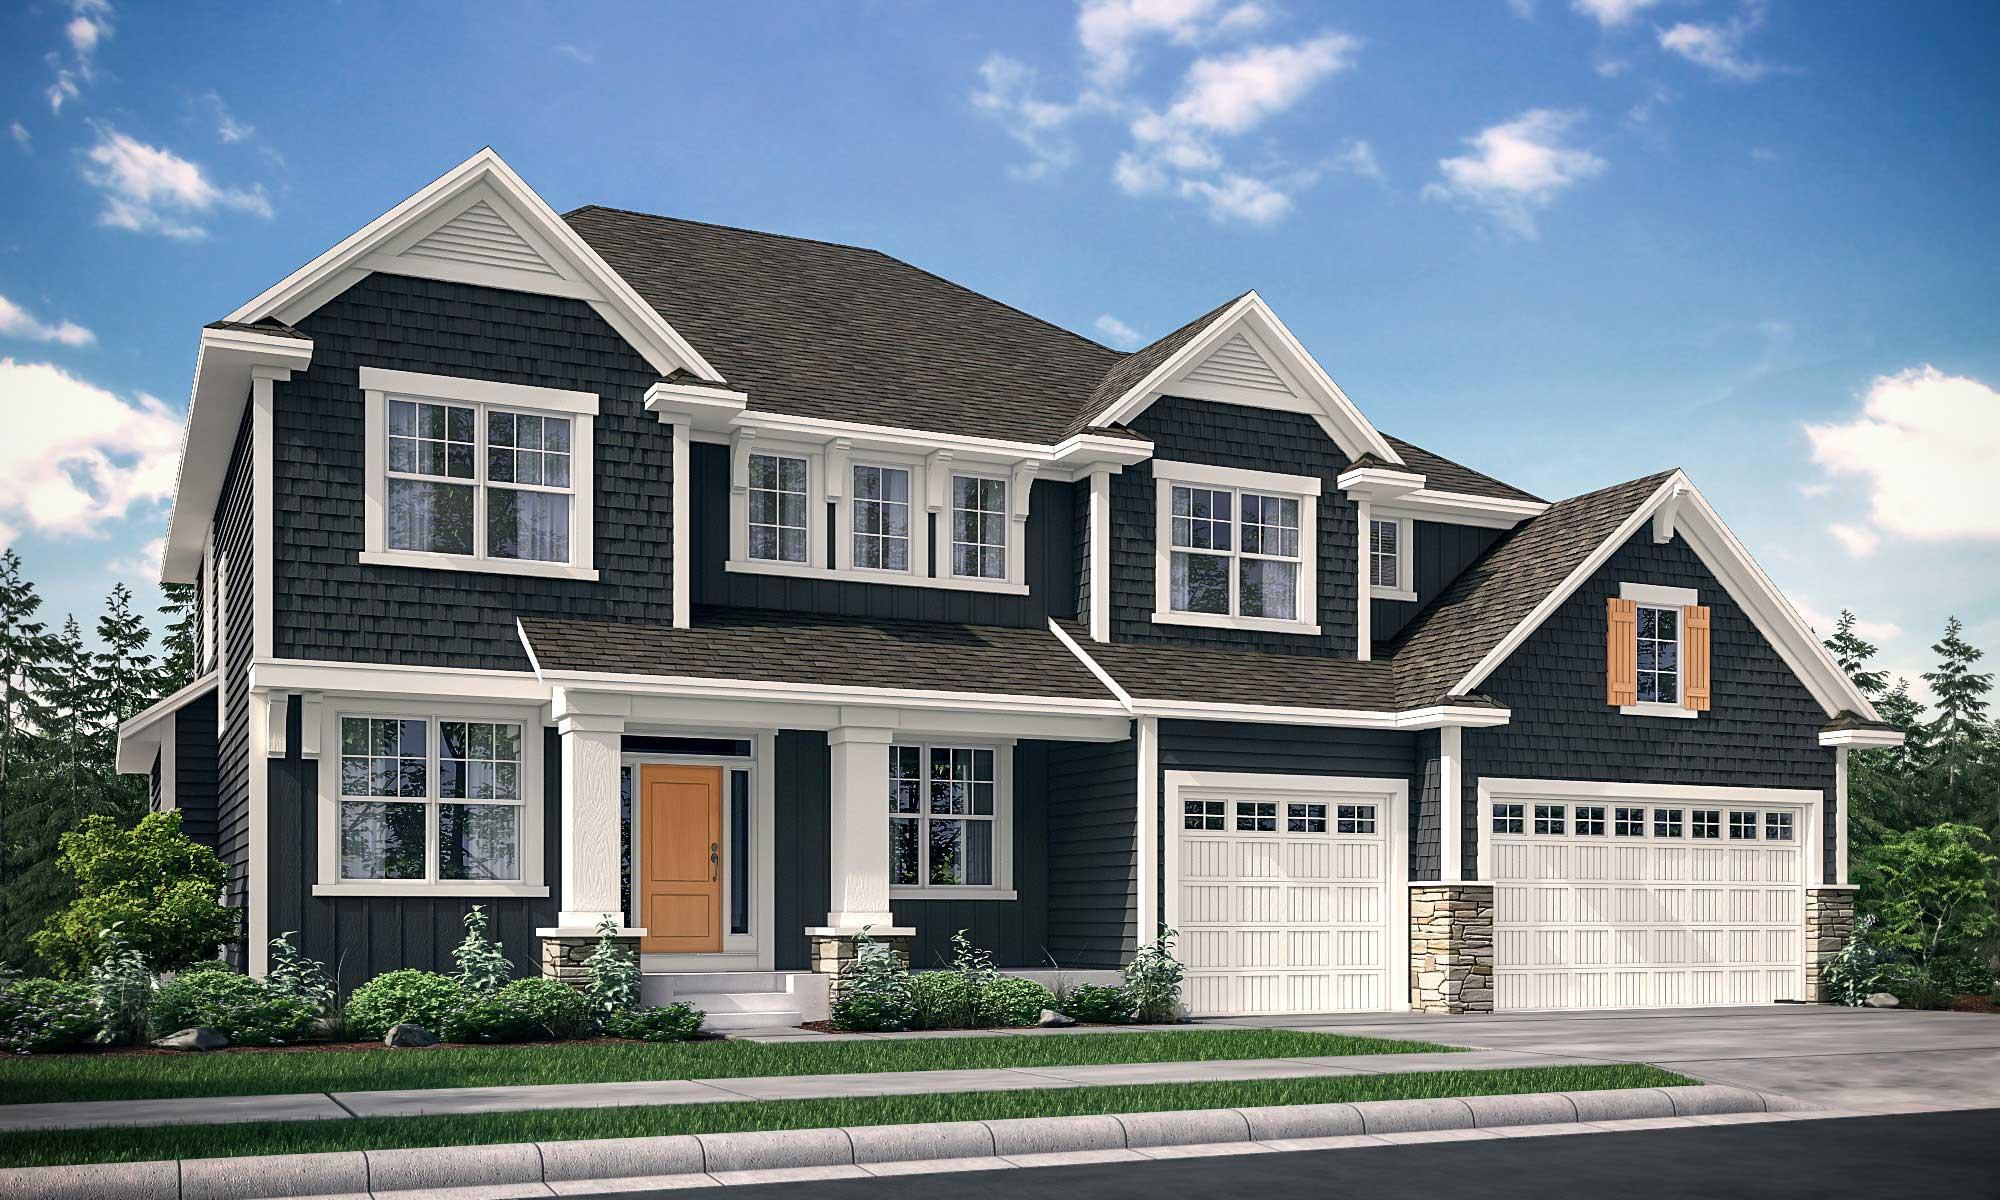 Exterior rendering of home with Nokomis B design